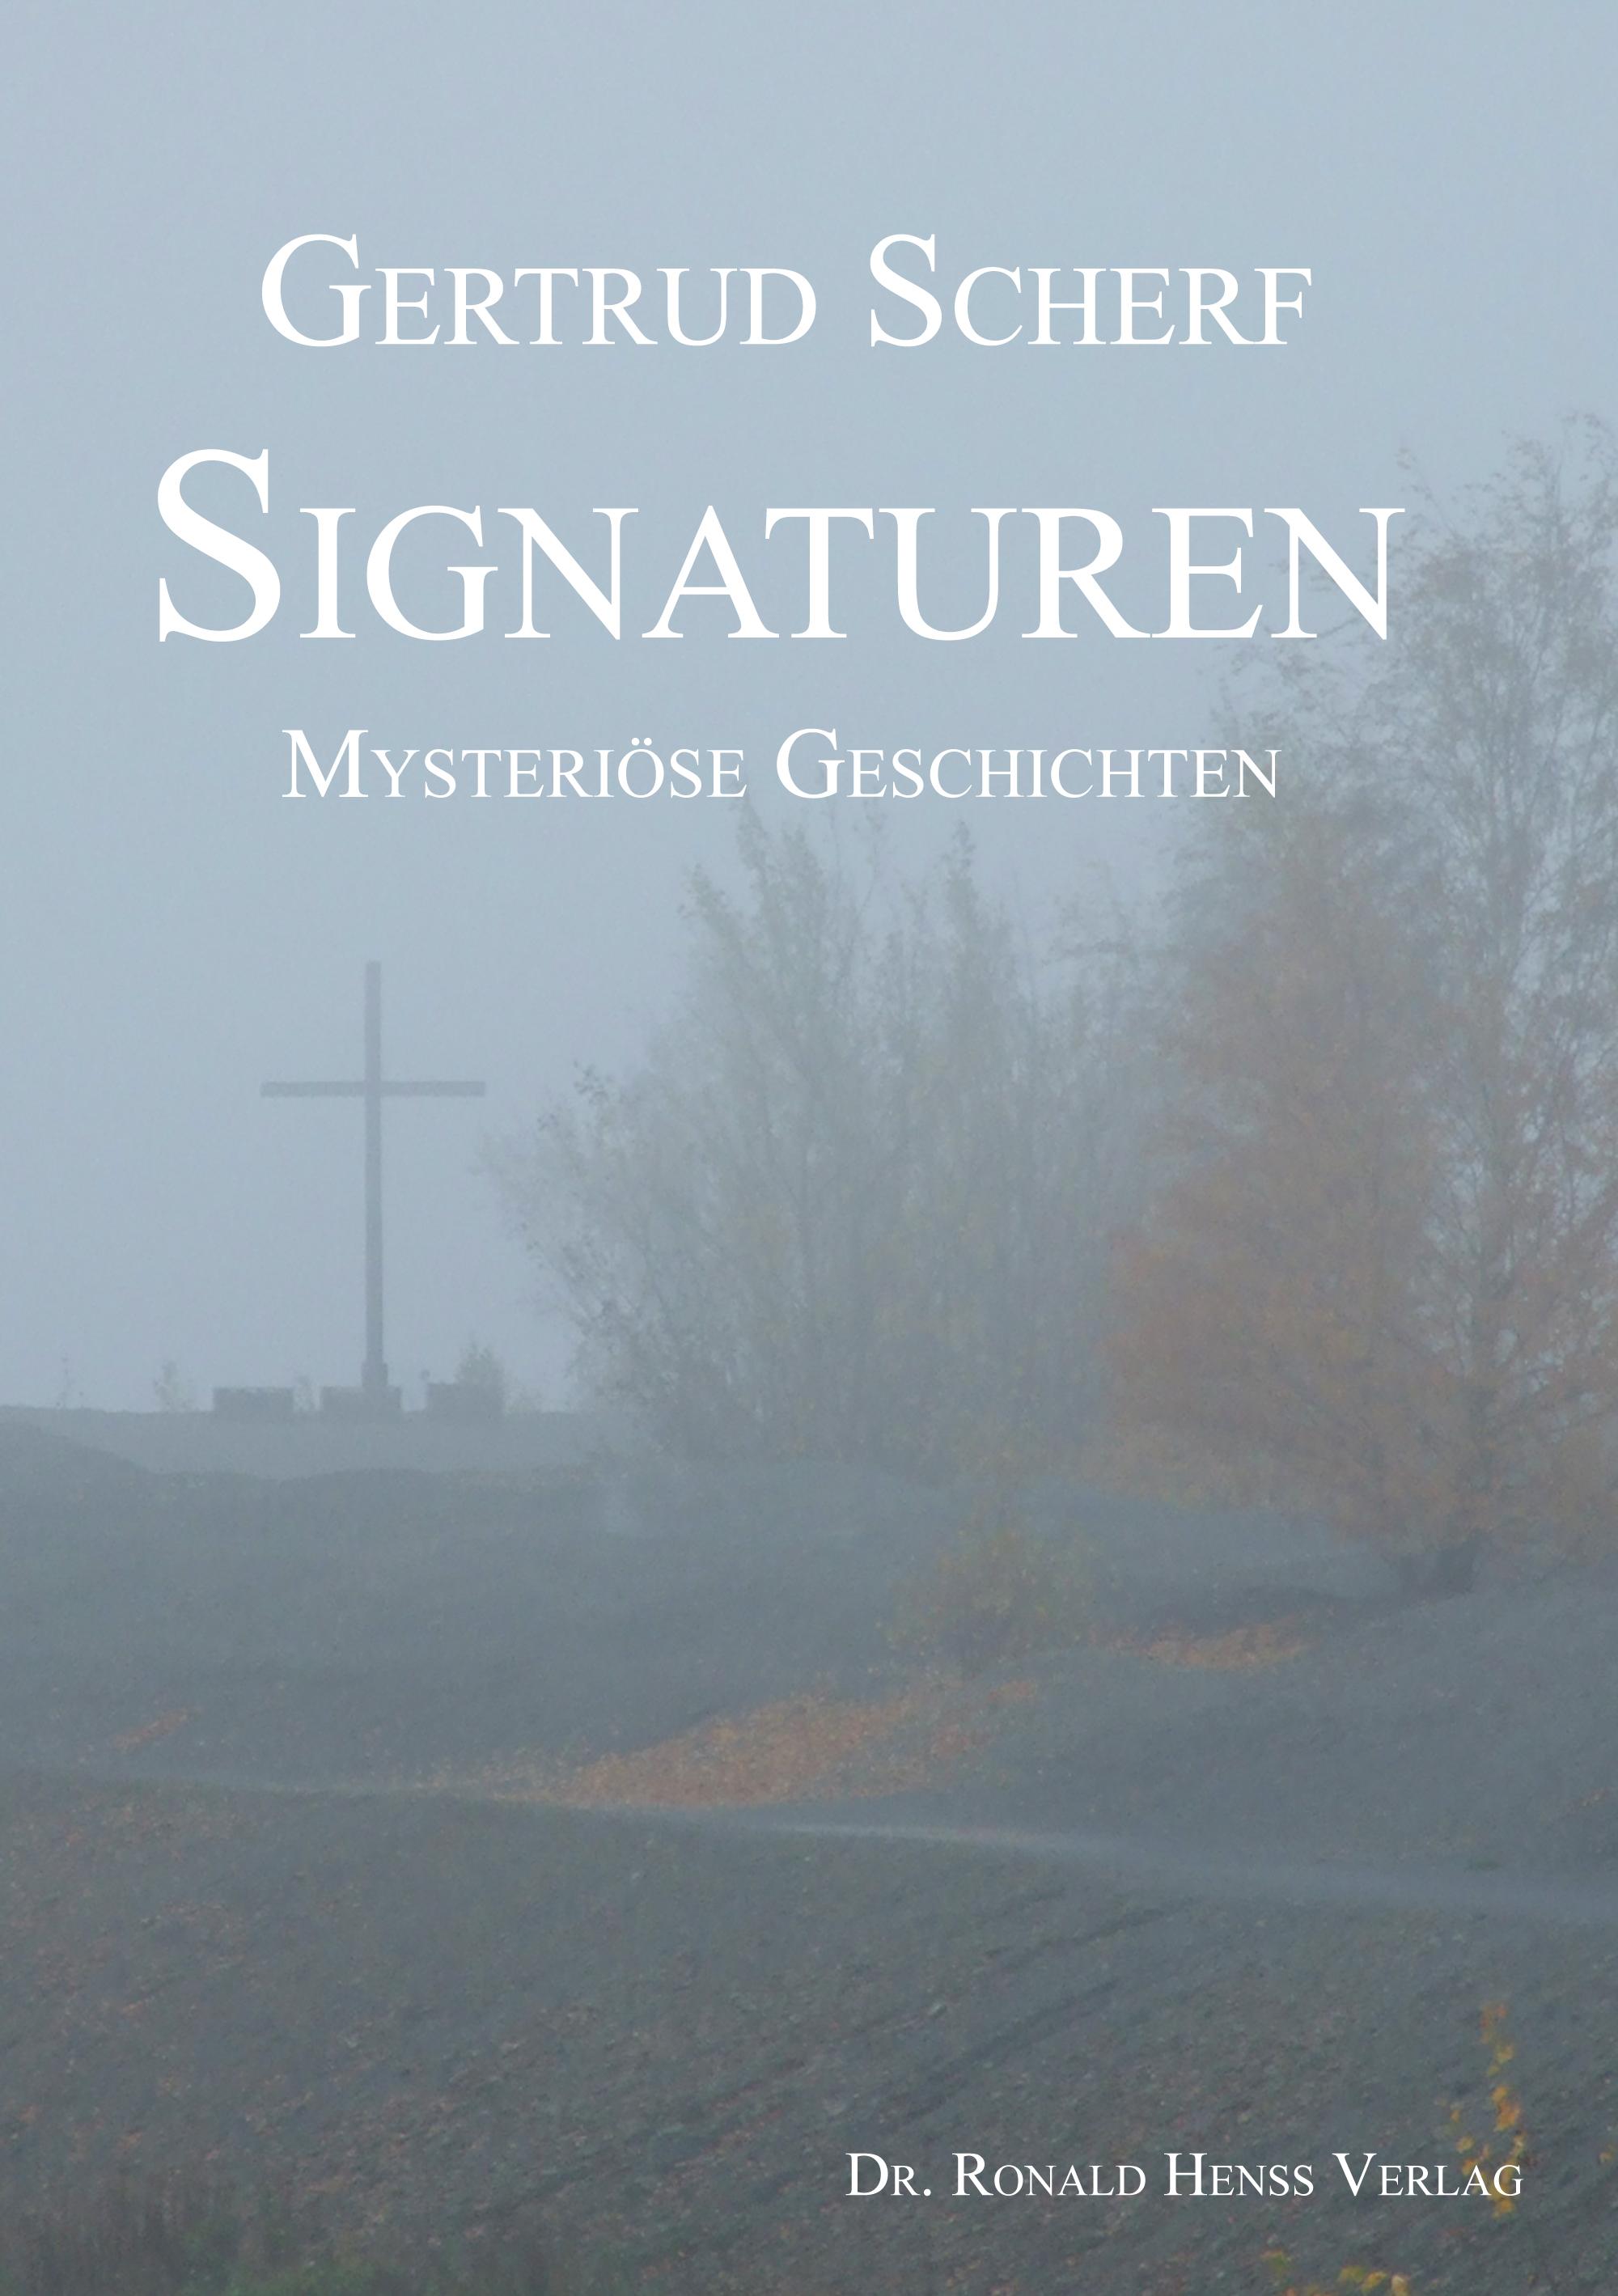 Signaturen Gertrud Scherf